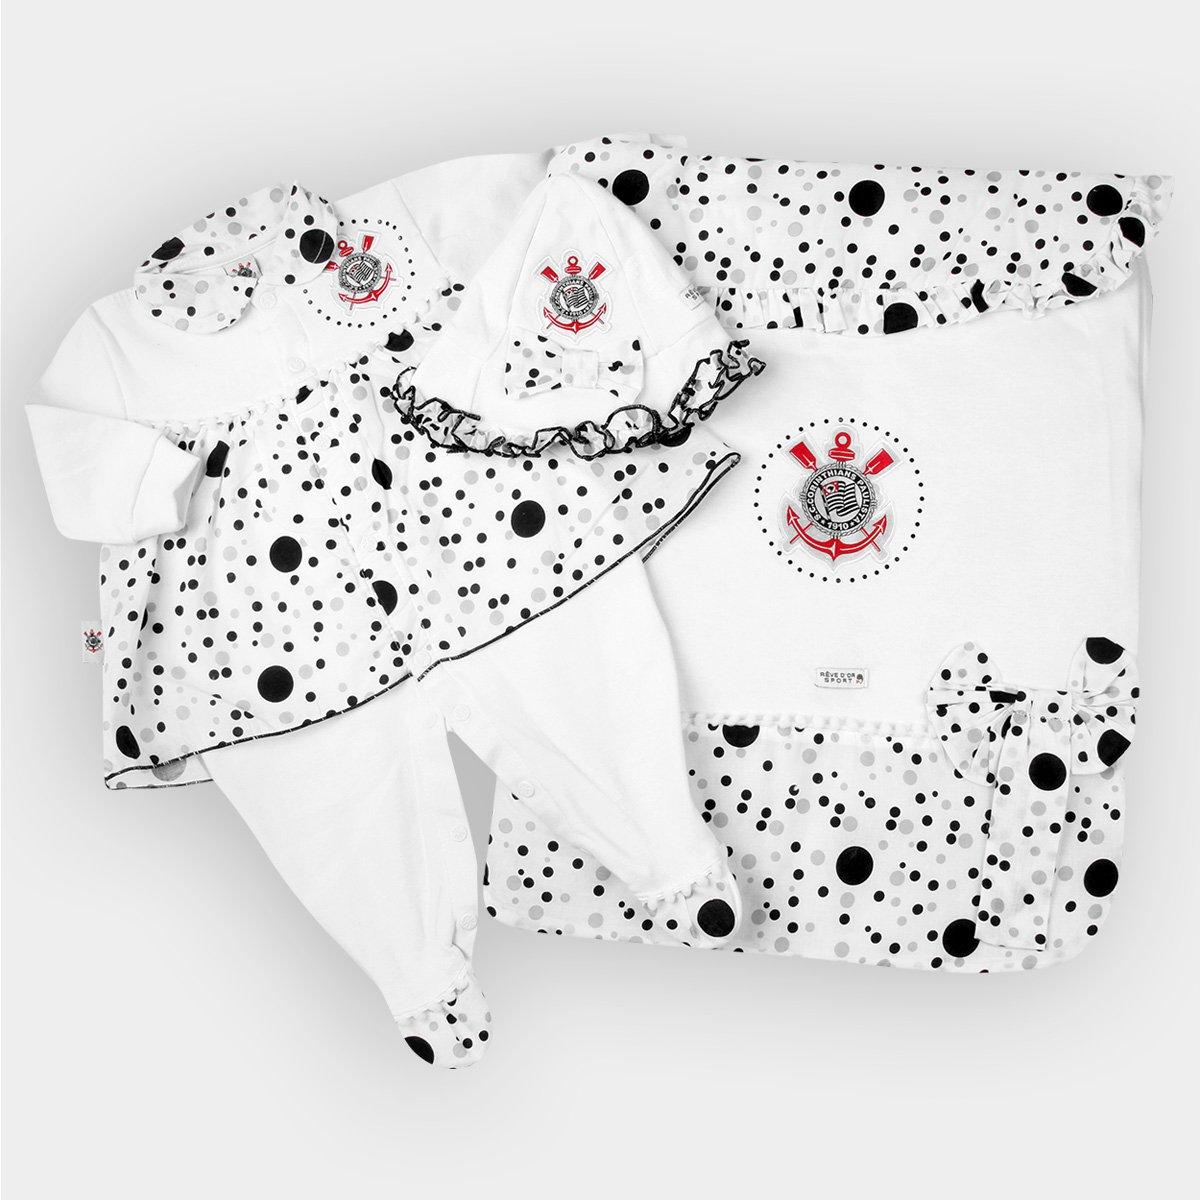 82b80ca28d8d Kit Maternidade Corinthians Bebê Vestido | Netshoes